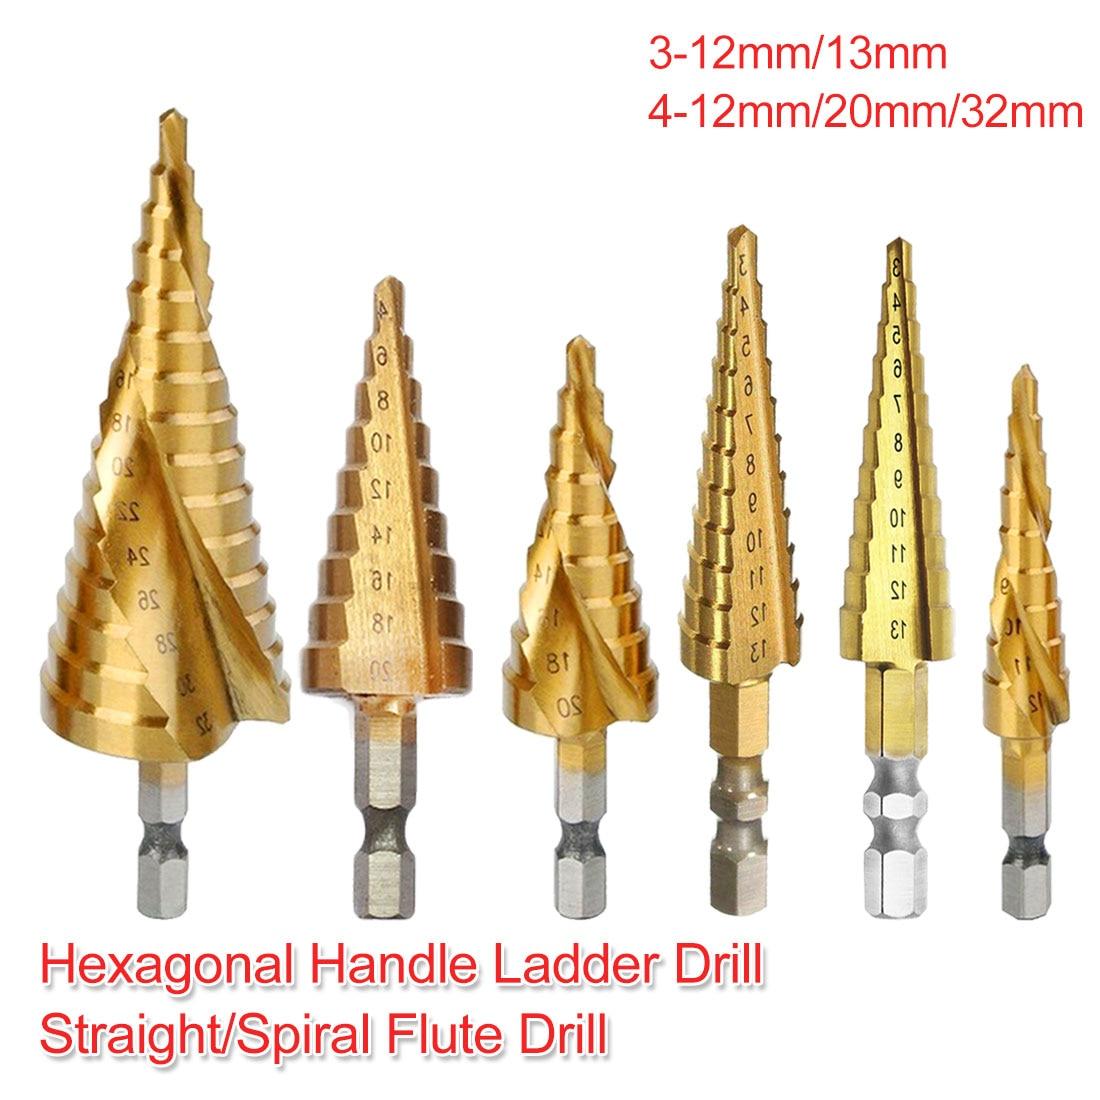 Step Drill 4-12mm/20mm/32mm 3-12mm/13mm HSS Titanium Coated Pagoda ShapeHex Shank Straight/Spiral Flute Drill For Wood/Metal